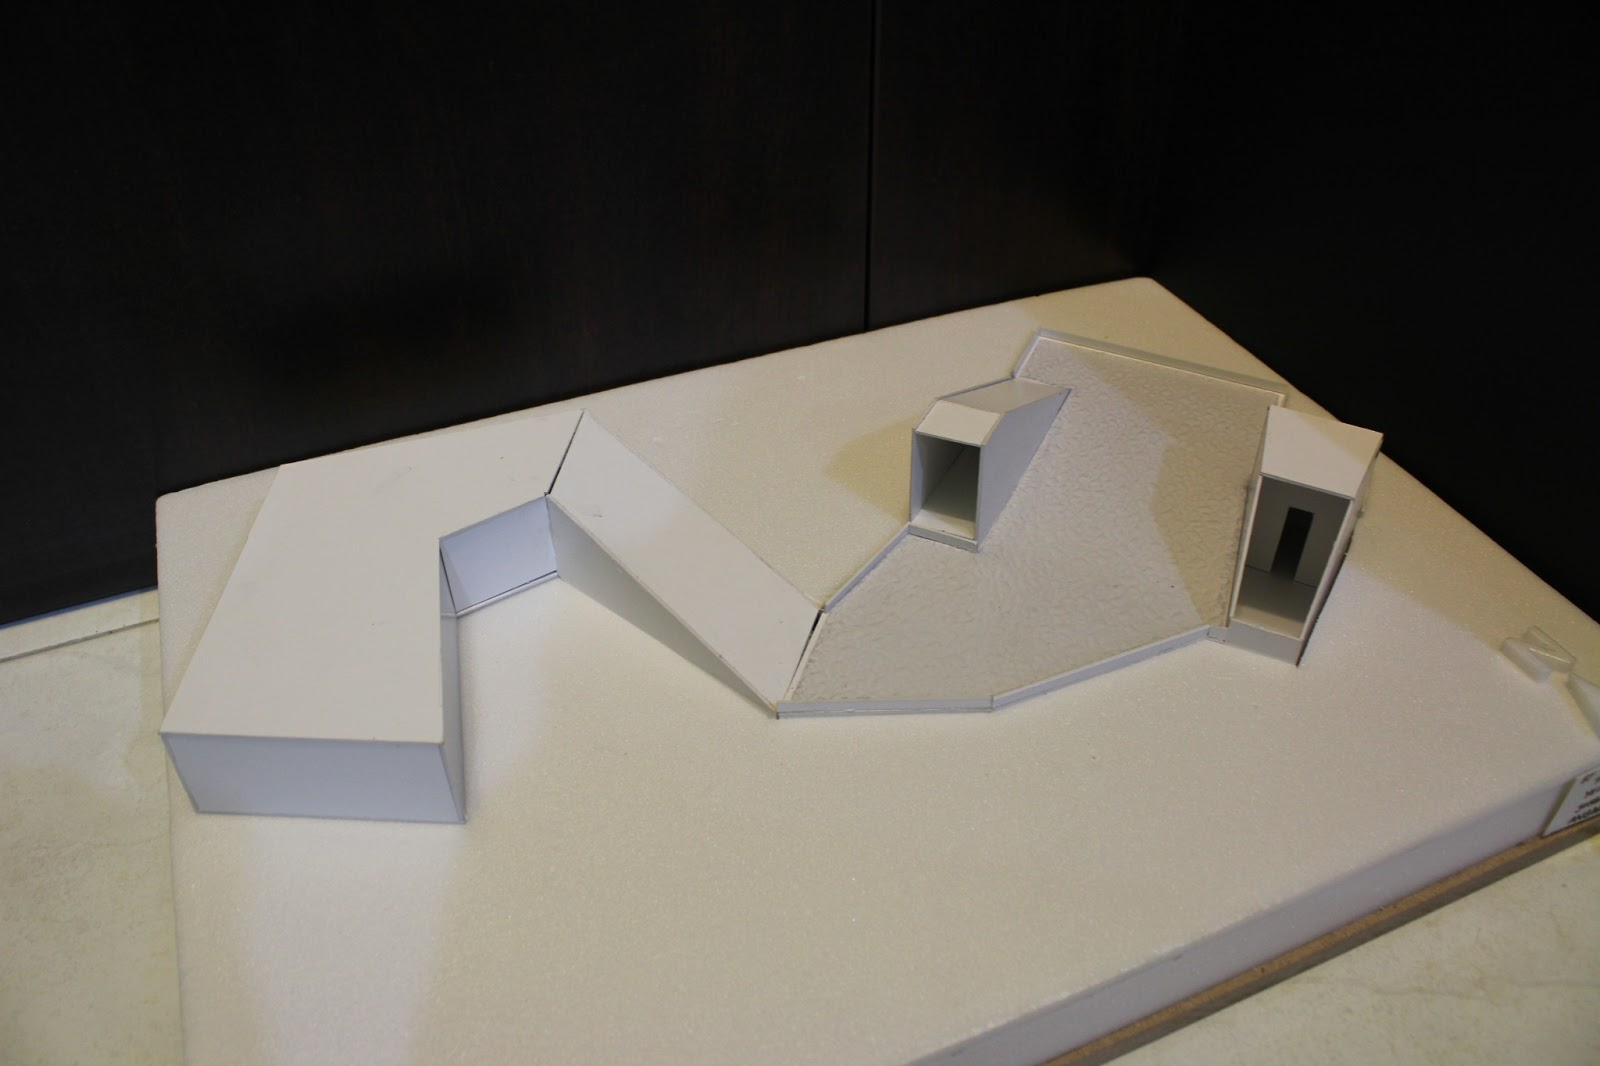 Architecture design studio 3 arc 2116 project 1 genius for Linear architecture design